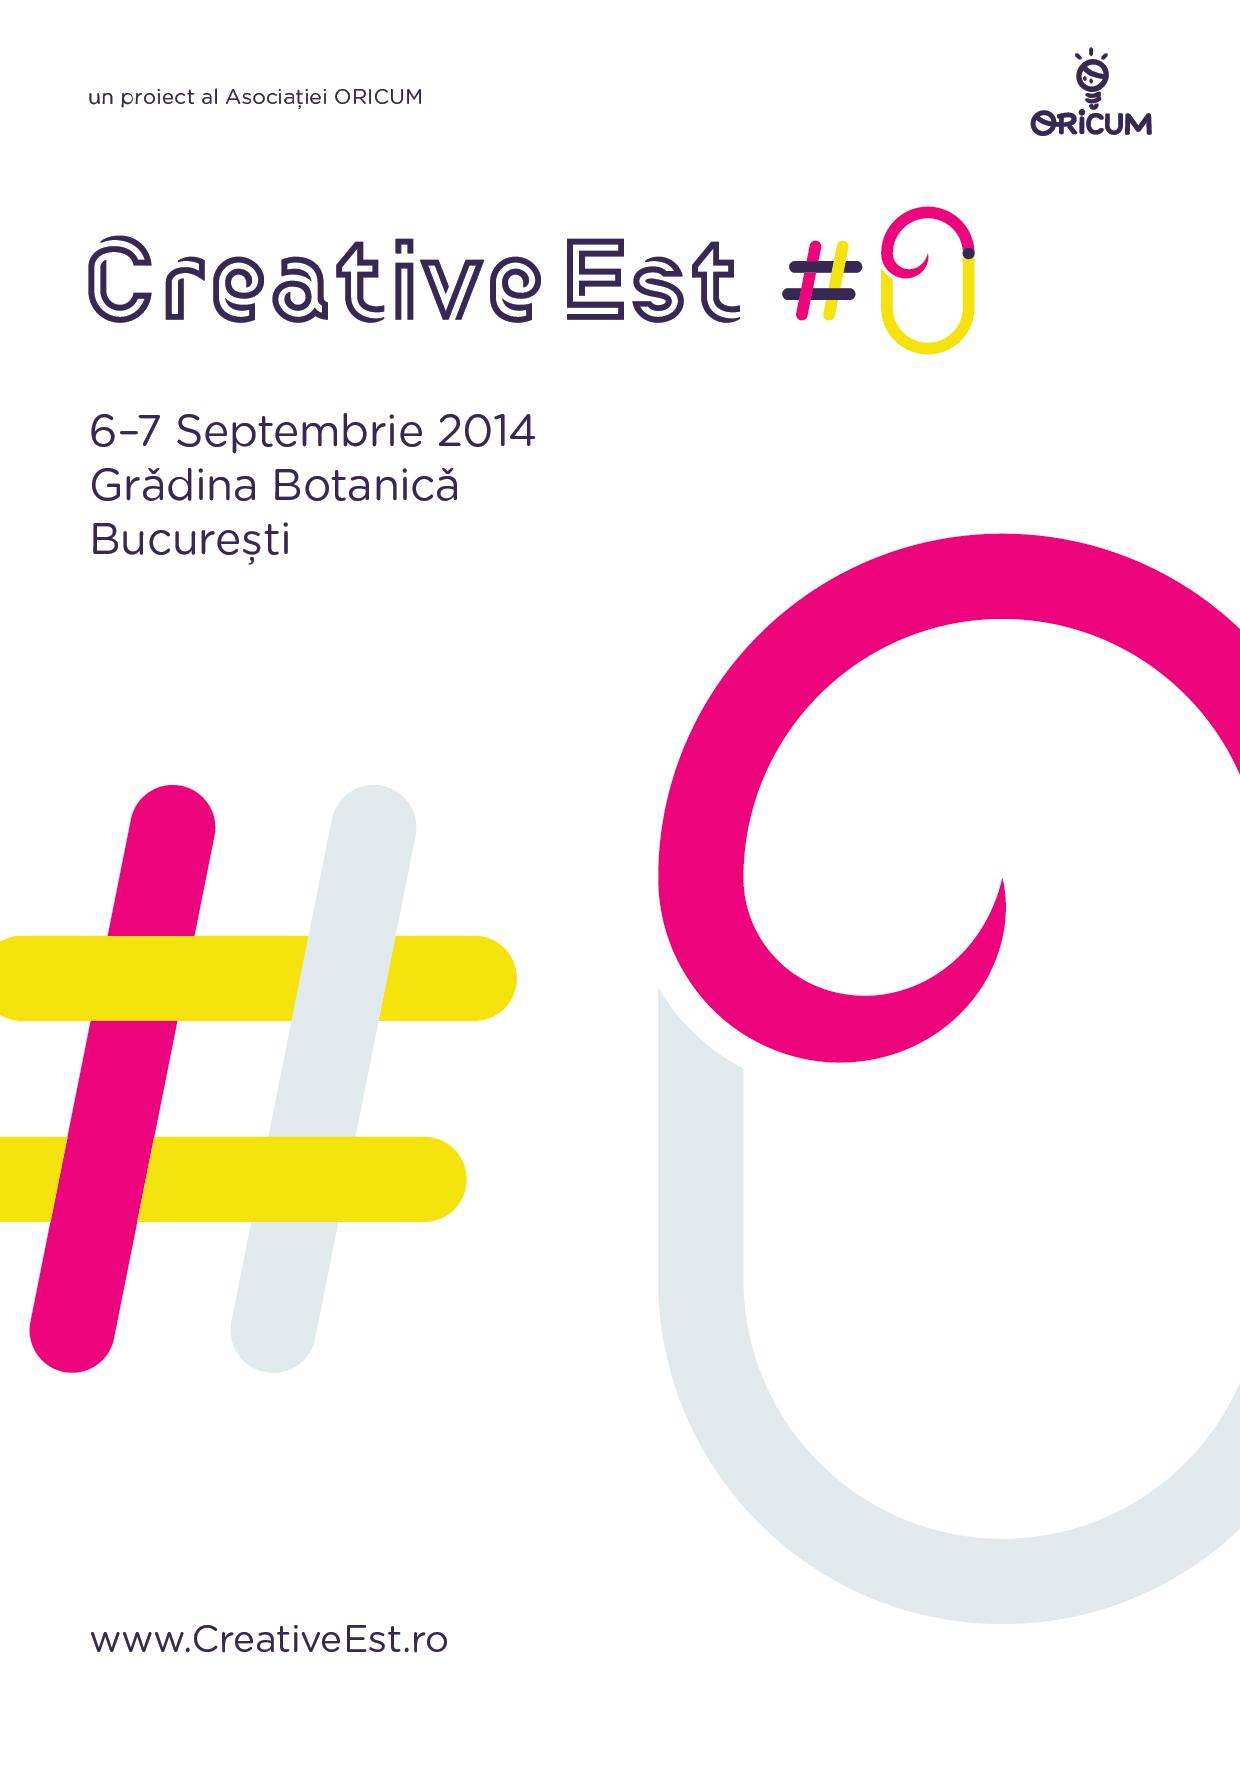 afis creative est #0